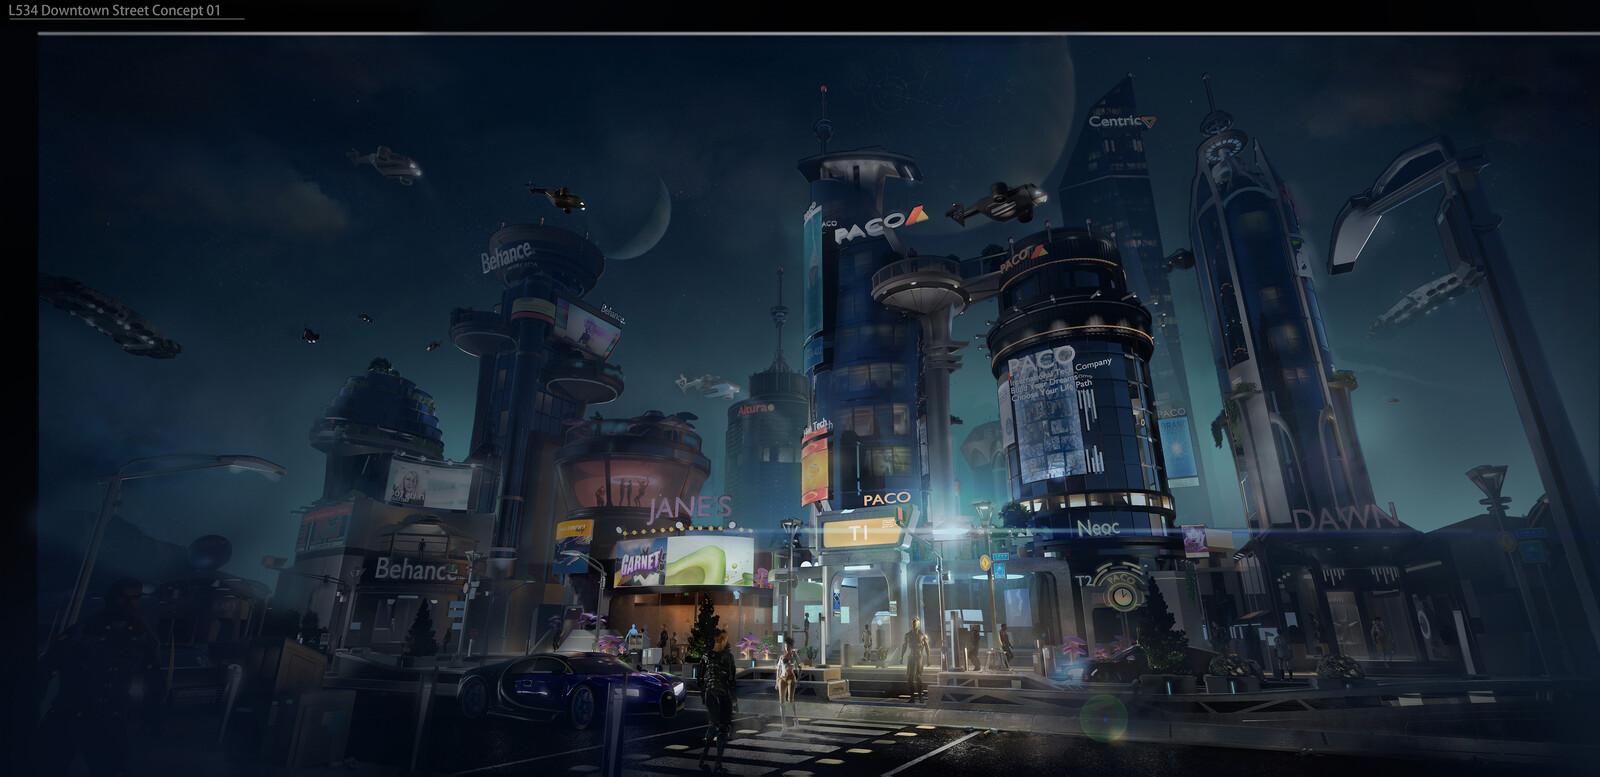 Planet L534 Sci-fi Concepts